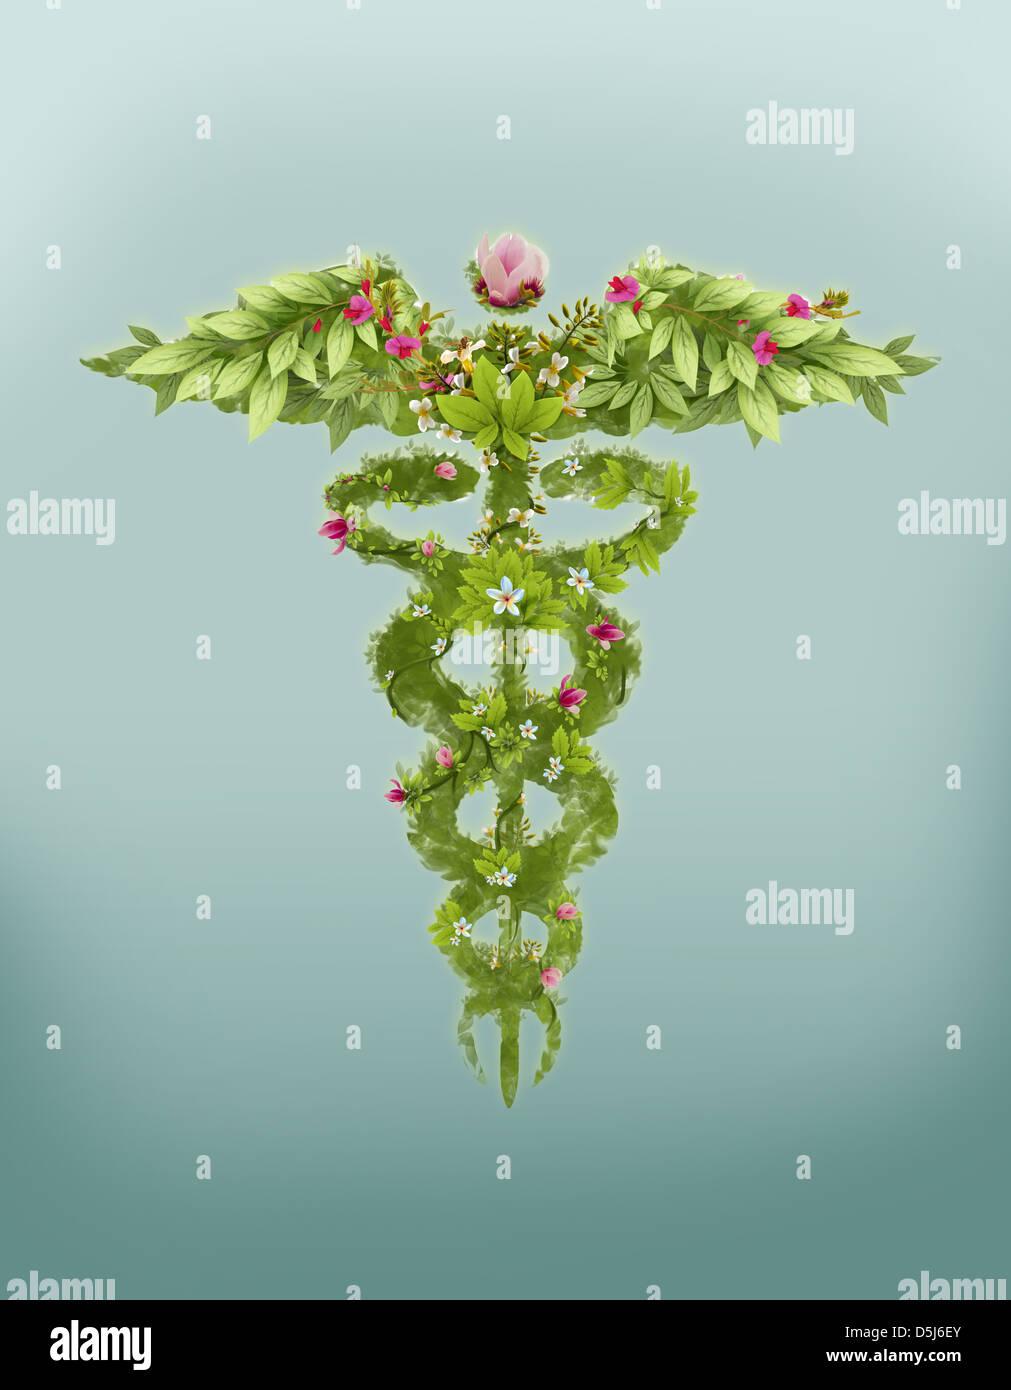 Illustrative image of caduceus symbol made of herbs representing natural medicine - Stock Image